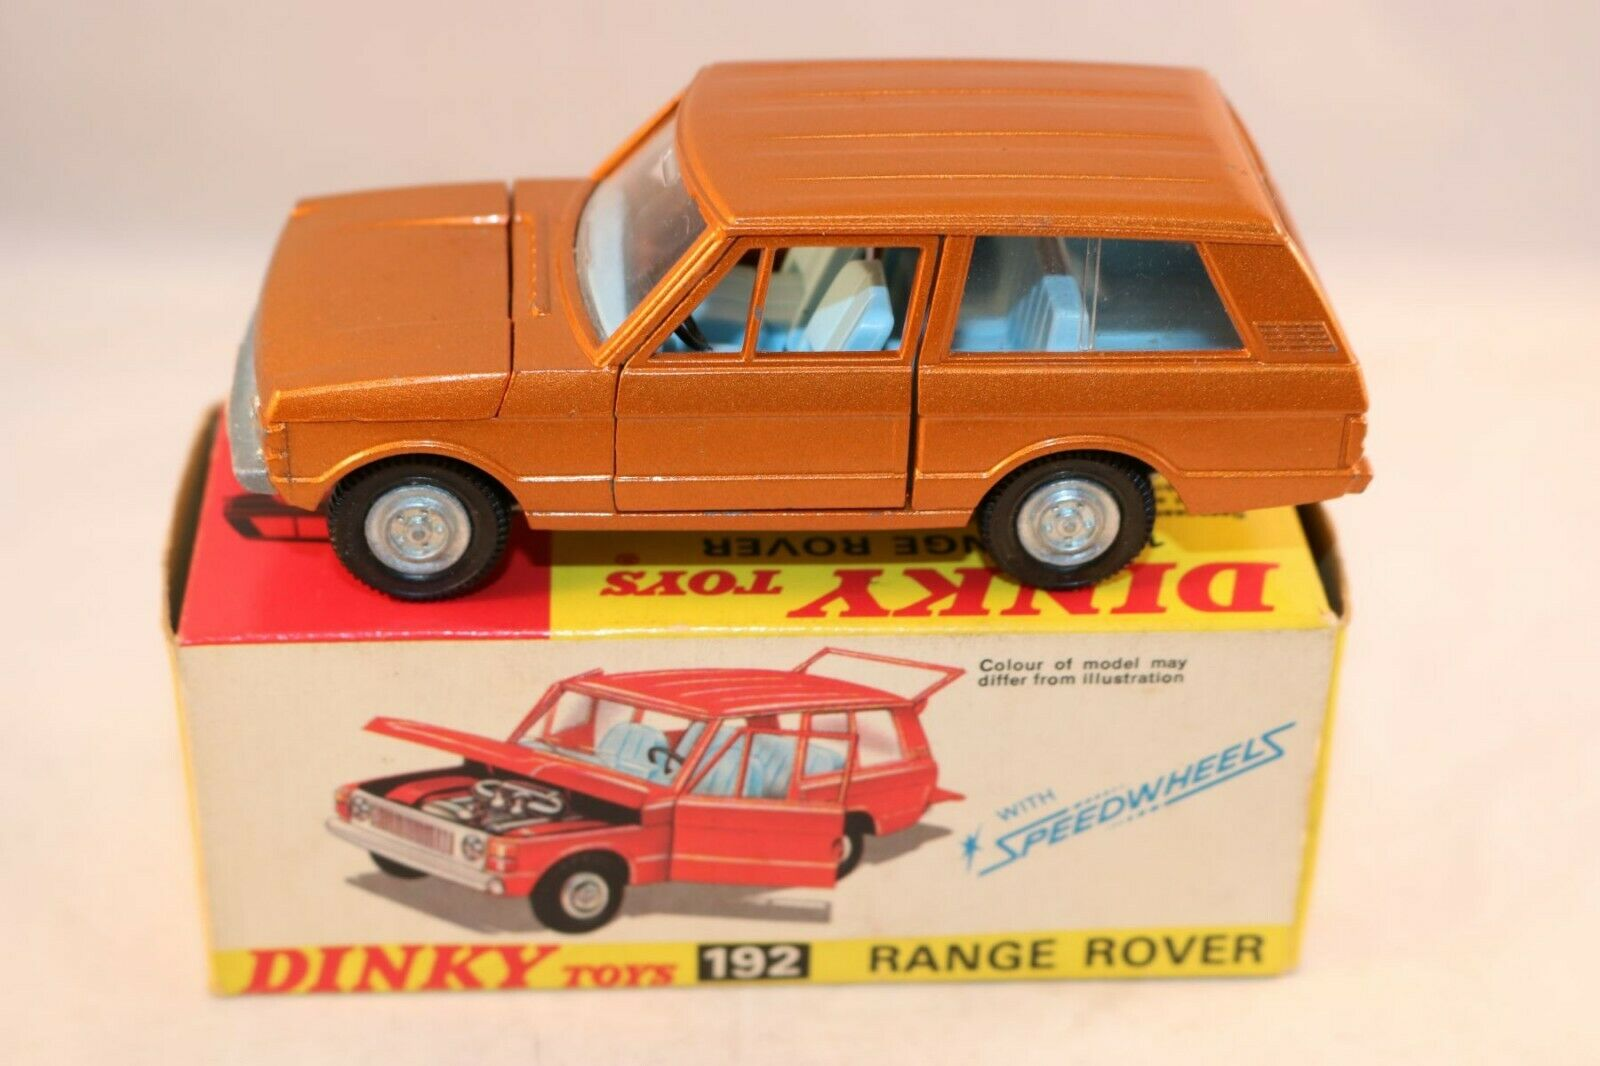 Dinky giocattoli 192 Range Rover very near mint in very near mint scatola tutti original